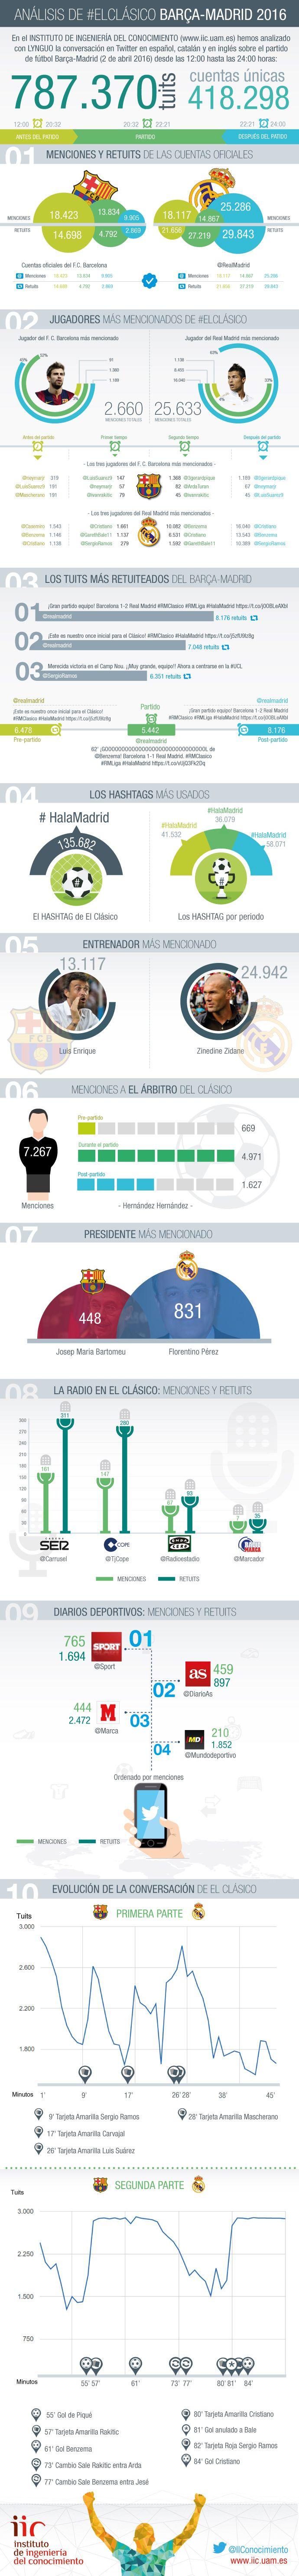 Análisis del partido Barcelona-Real Madrid 2016 en Twitter #infografia